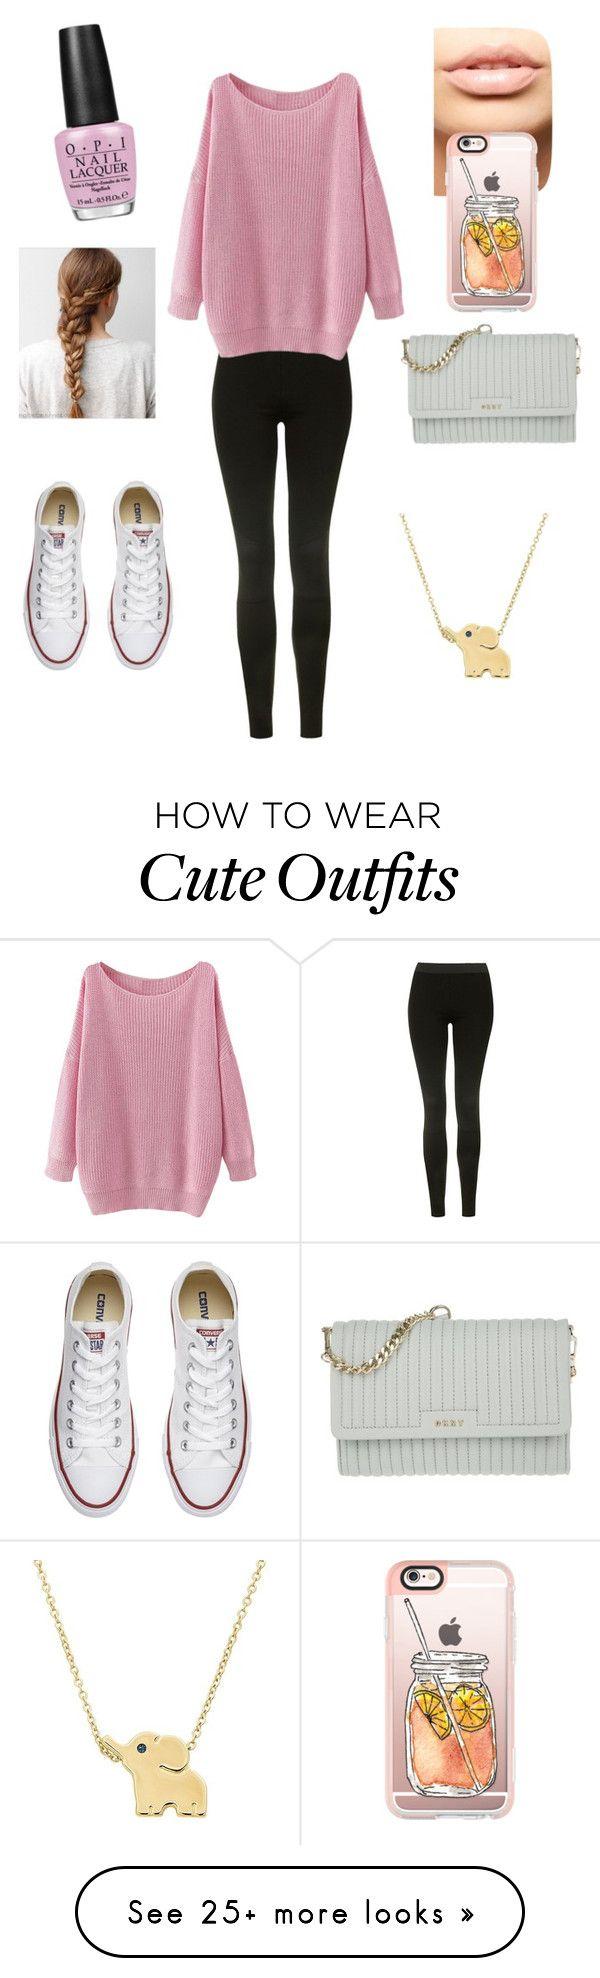 sudadera rosa, leggins negros, tenis blancos.